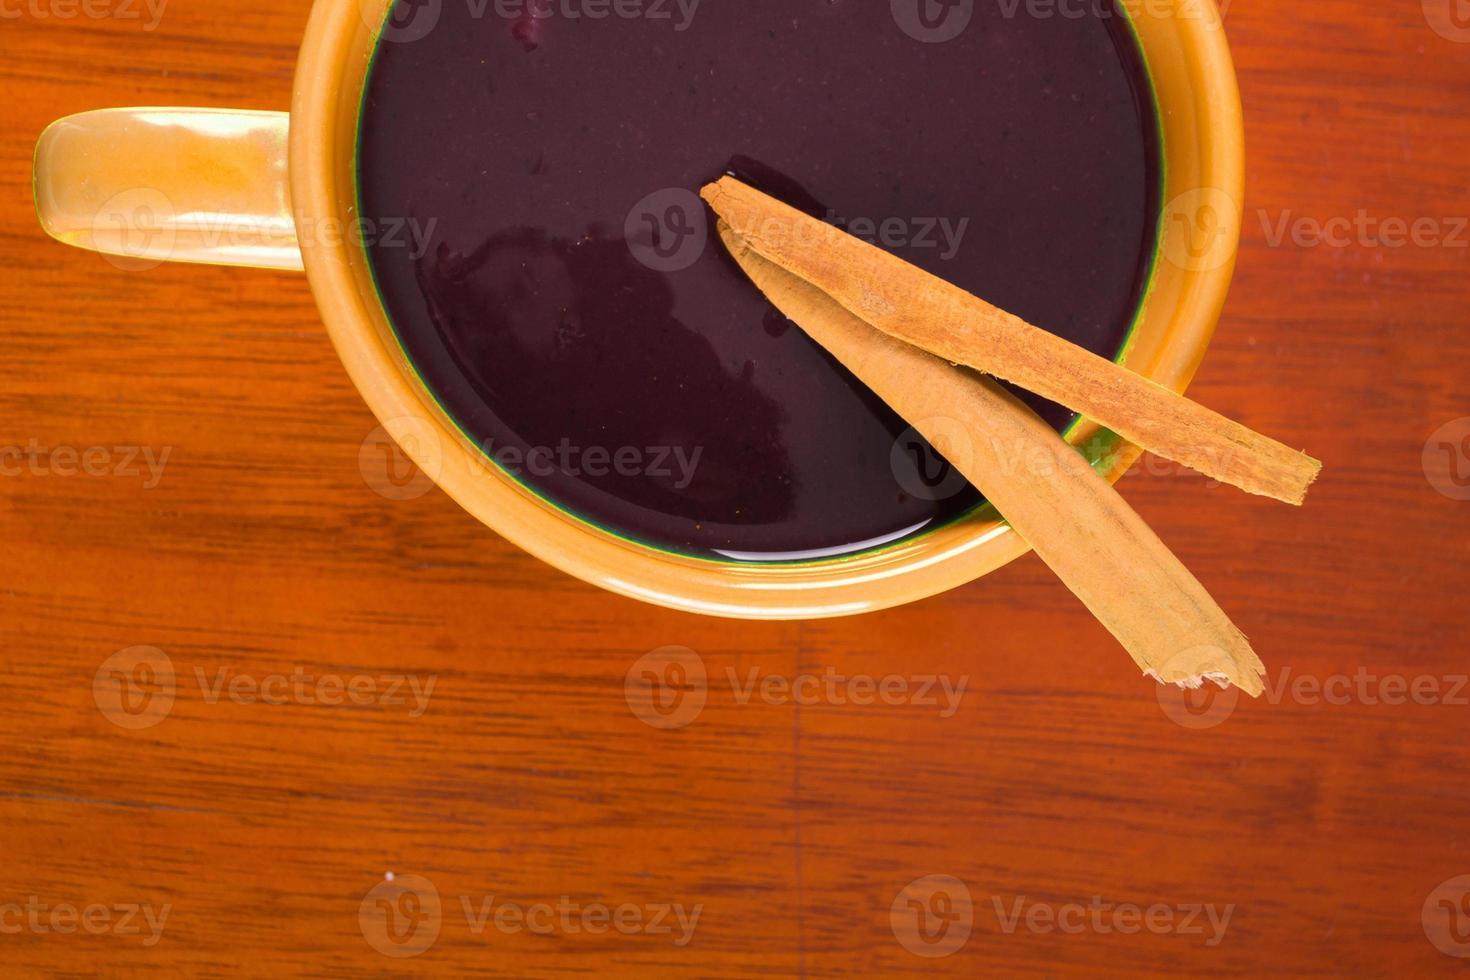 röd soppa på en orange skål foto